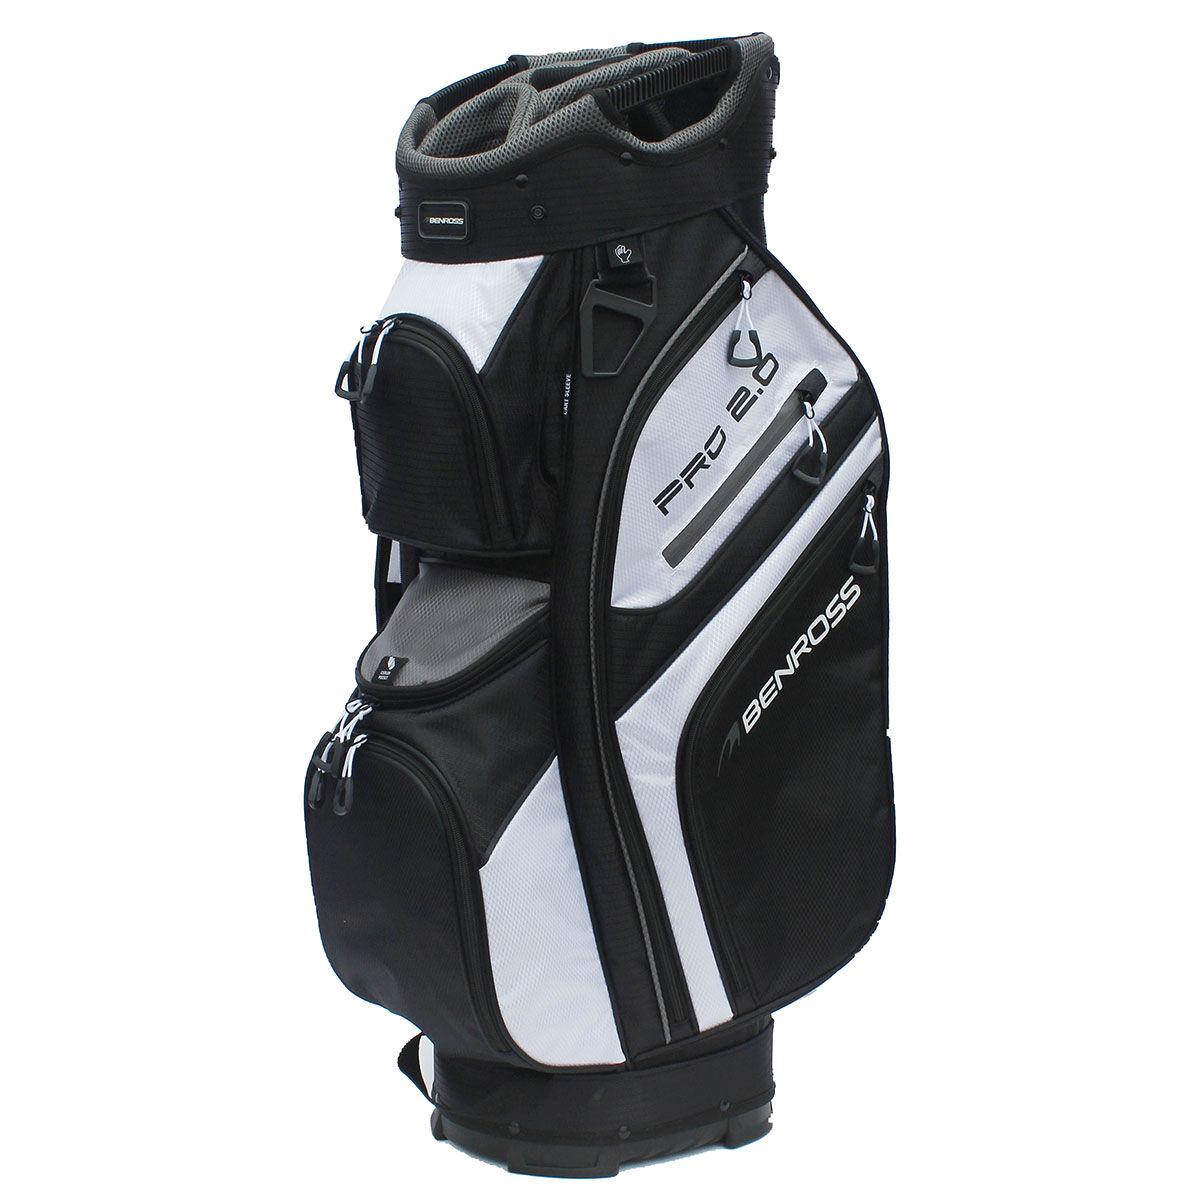 Sac chariot Benross PROTEC 2.0 Deluxe, homme, Noir/Blanc/Gris    Online Golf